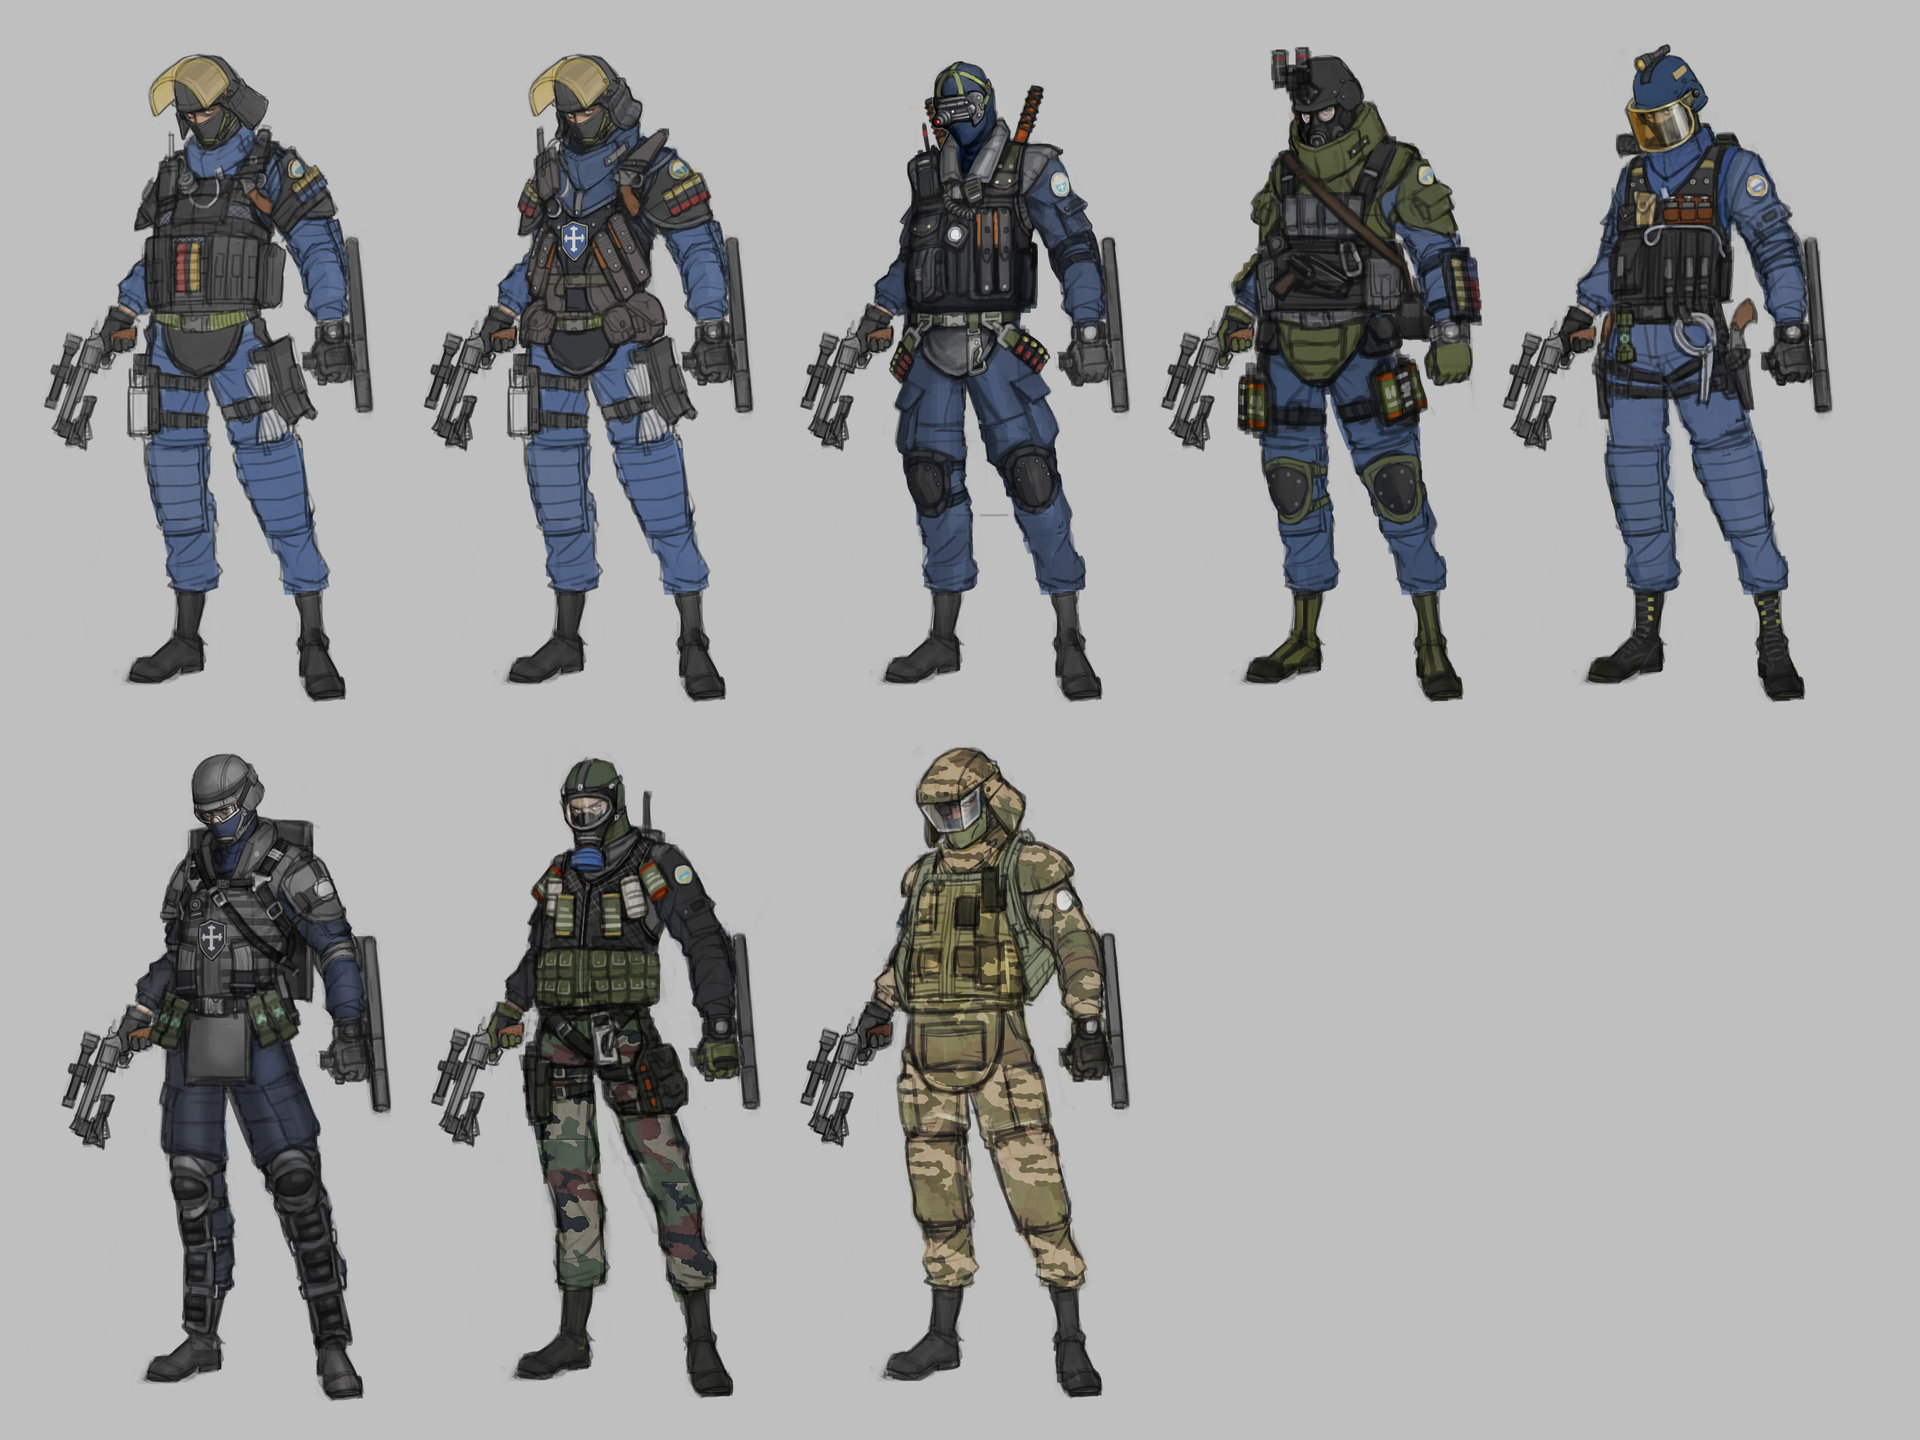 Special Forces Concept Art